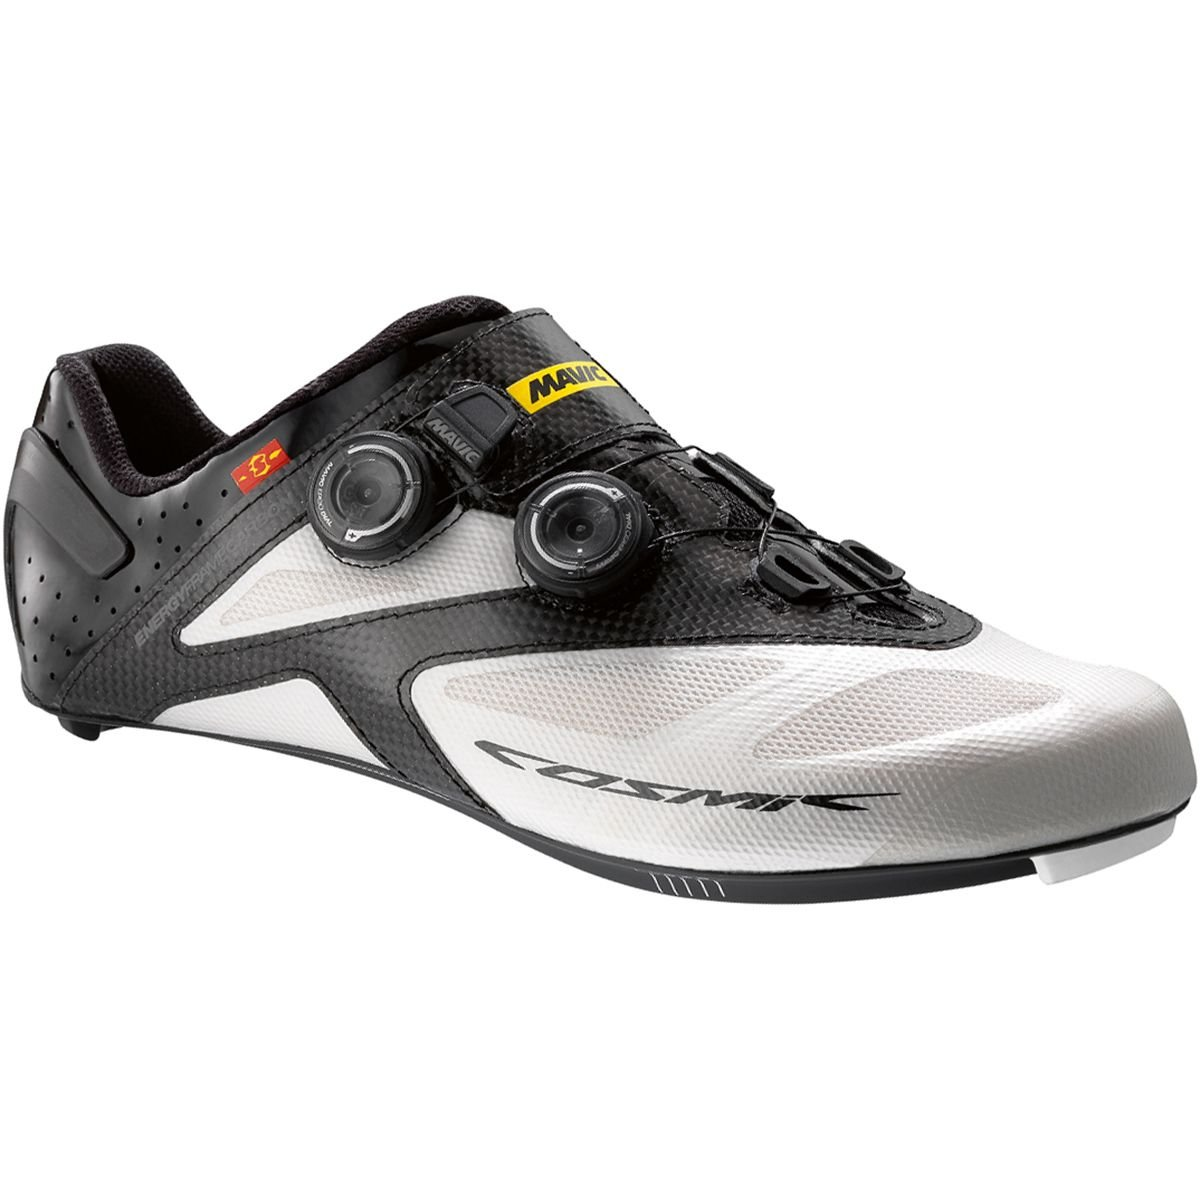 Mavic Cosmic Ultimate Rennrad Fahrrad Schuhe Schuhe Schuhe weiß schwarz 2018  Größe  39 6f9d9e